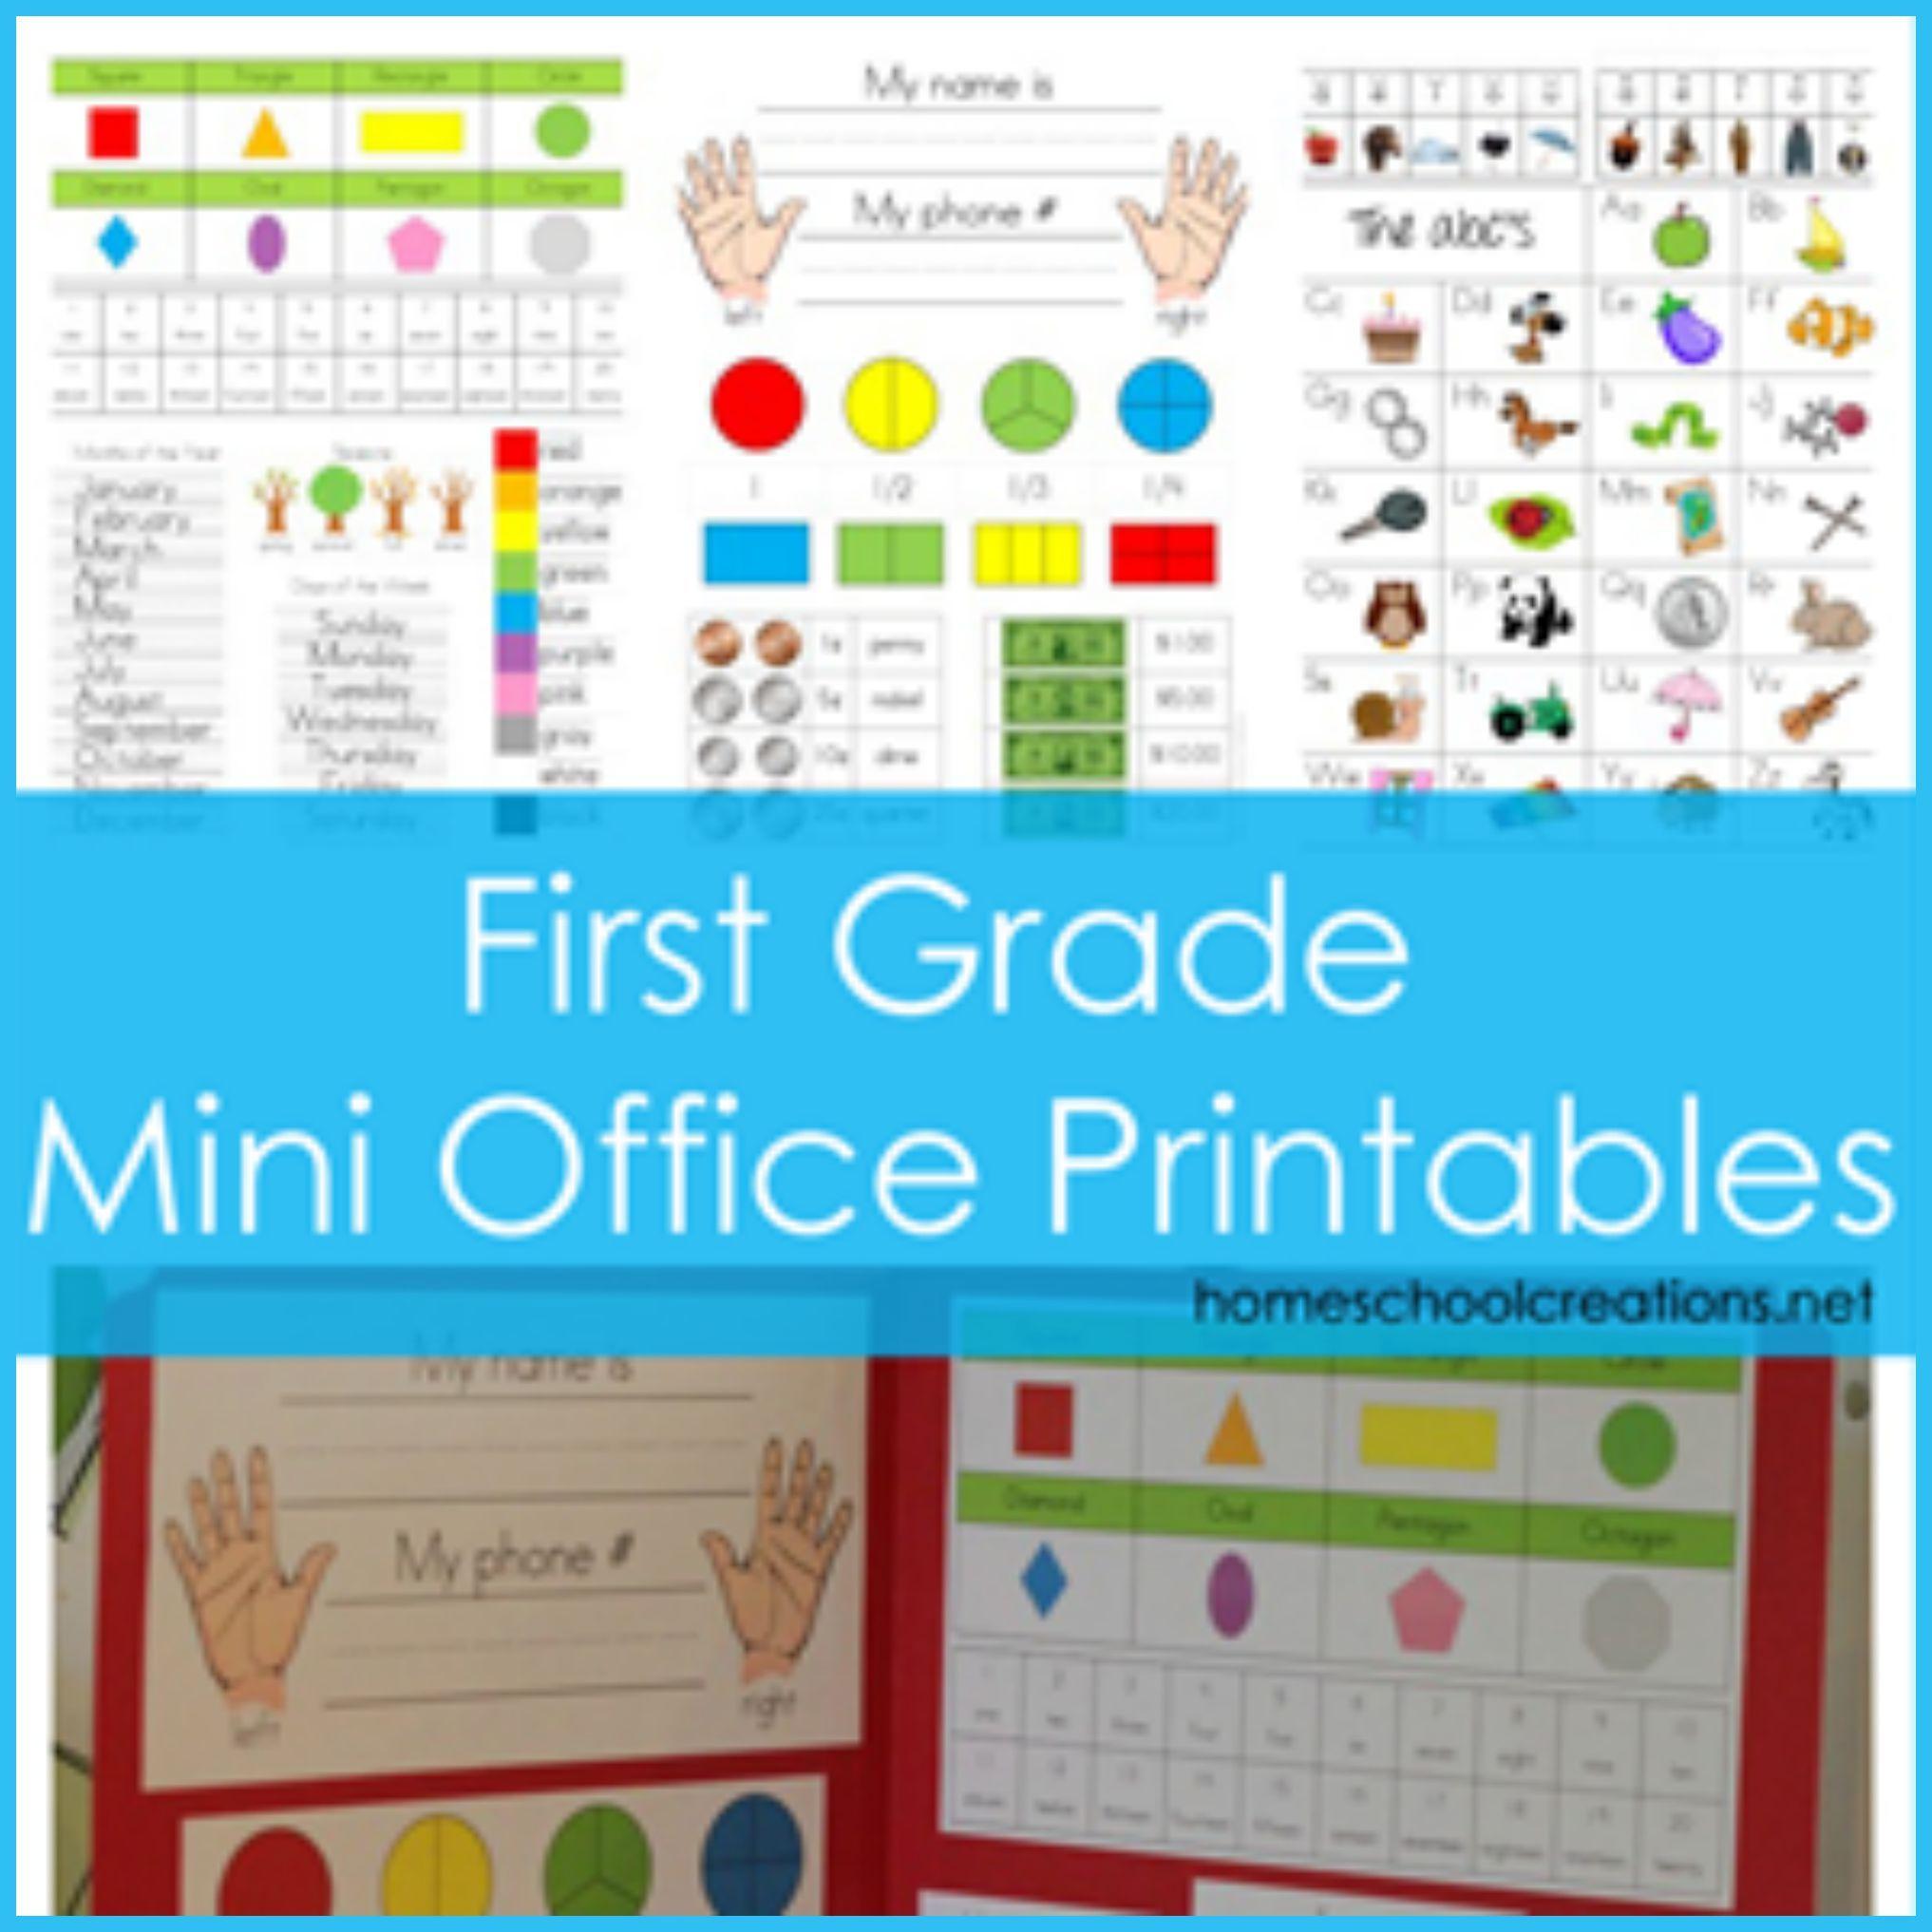 First Grade Mini Office Printables | WRITING | Pinterest | Mini ...